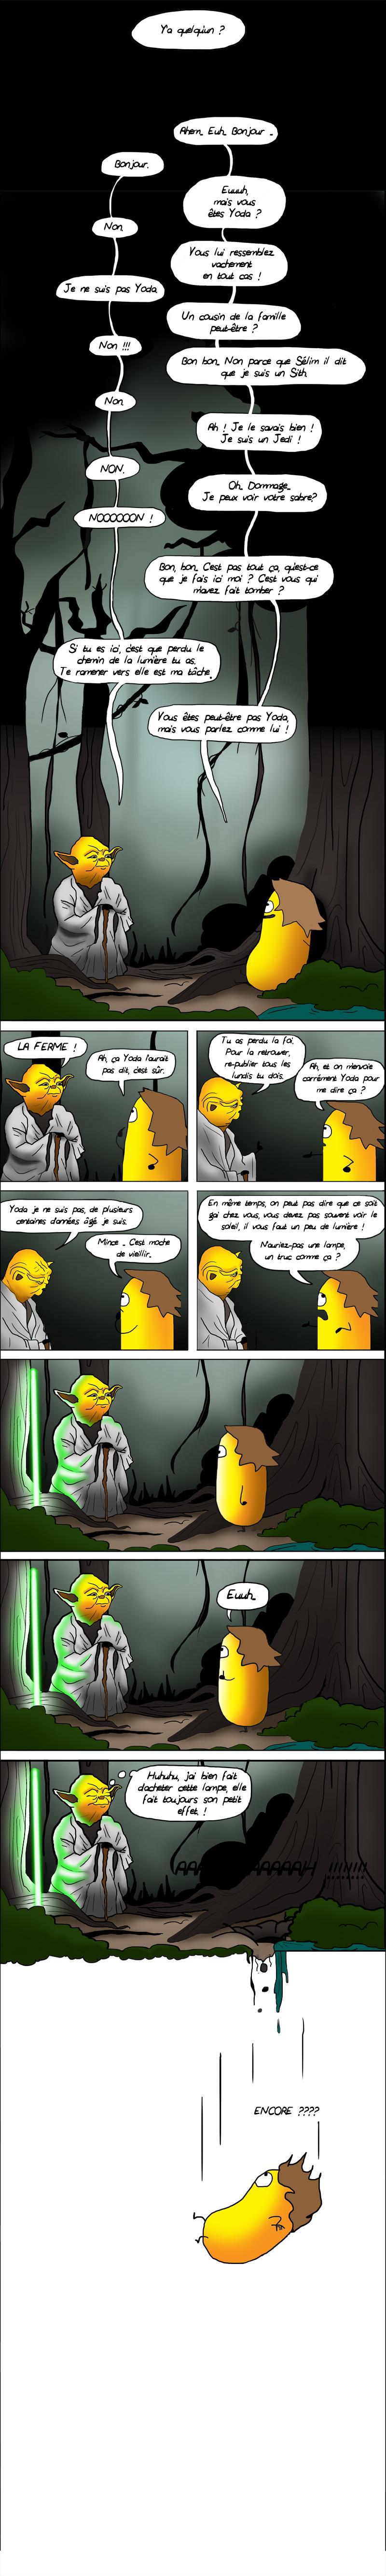 Star Wars Patate2